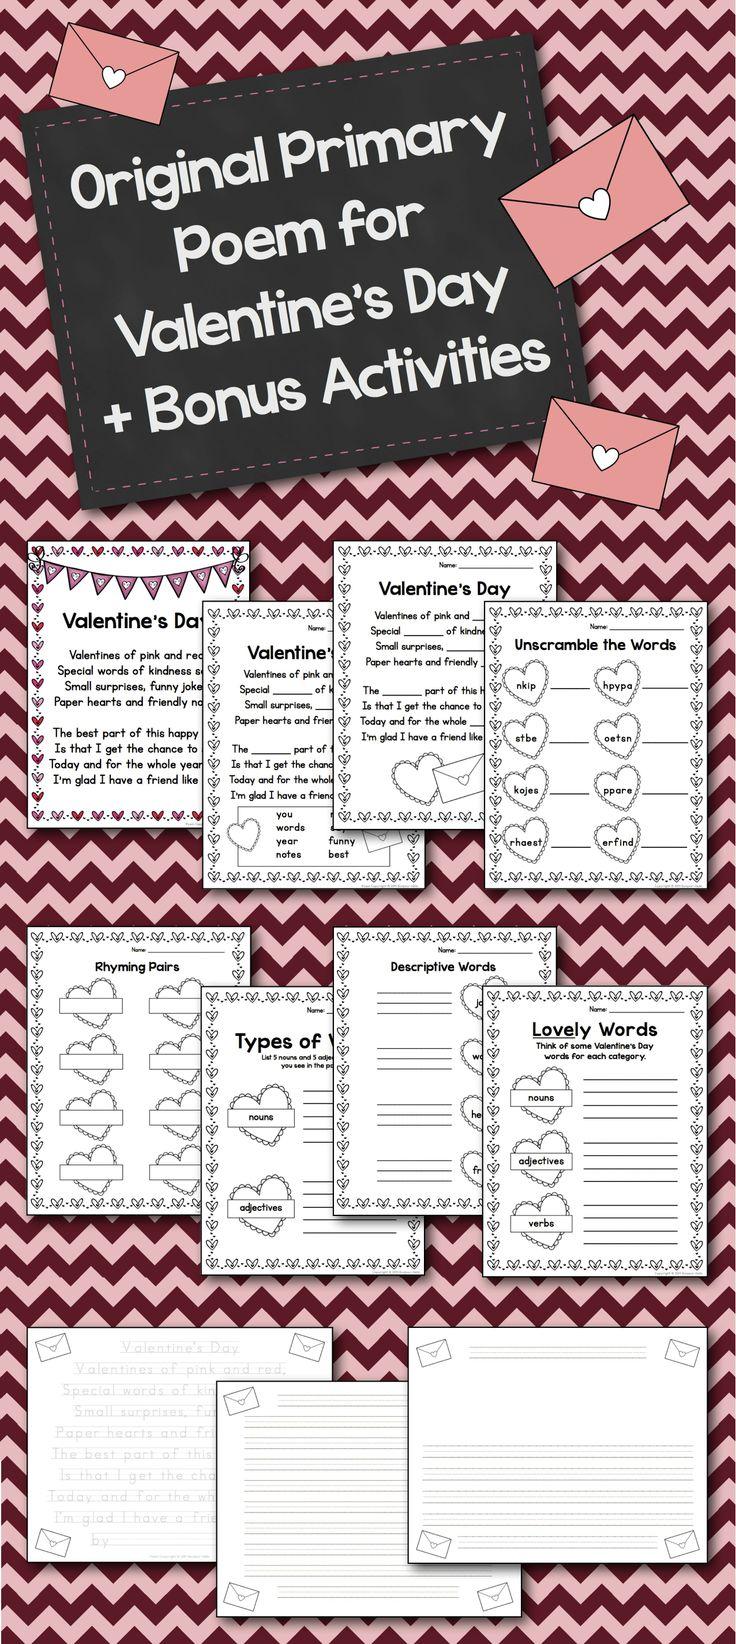 $ Original Primary Poem for Valentine's Day + Bonus Activities by @Jacqueline Bisille-Hello